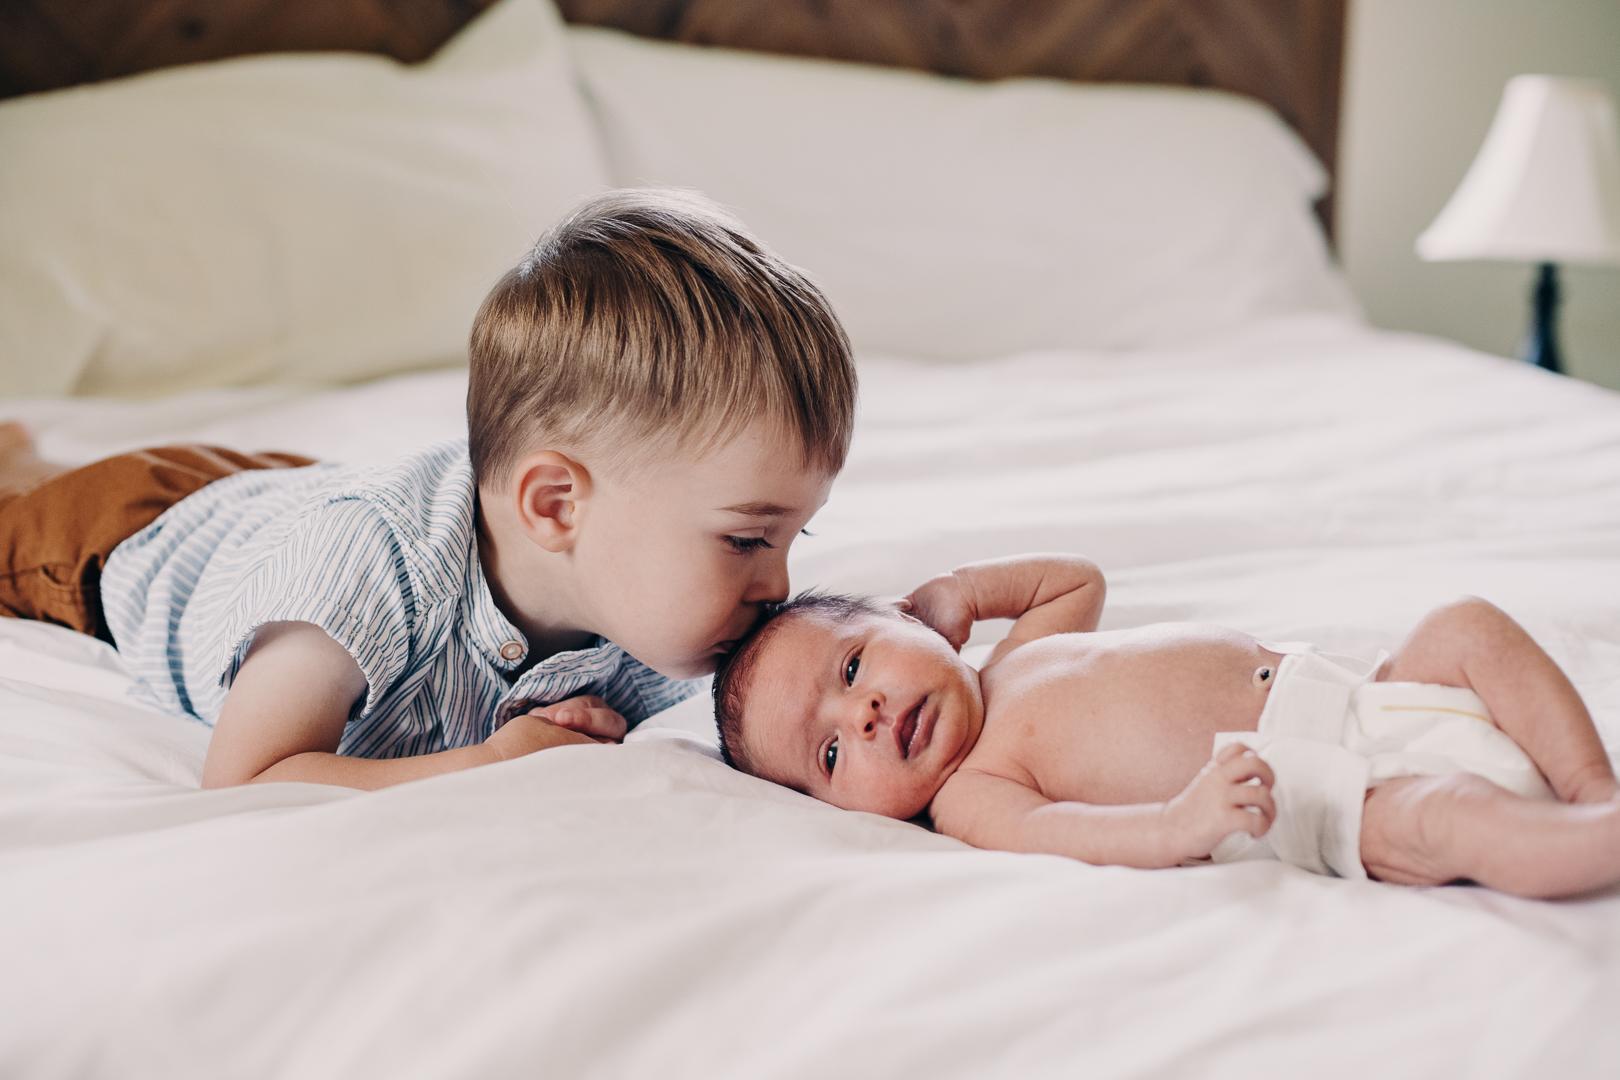 TerraSuraPhotography-Sloane Vasseur Family Newborn-Web-5464.jpg